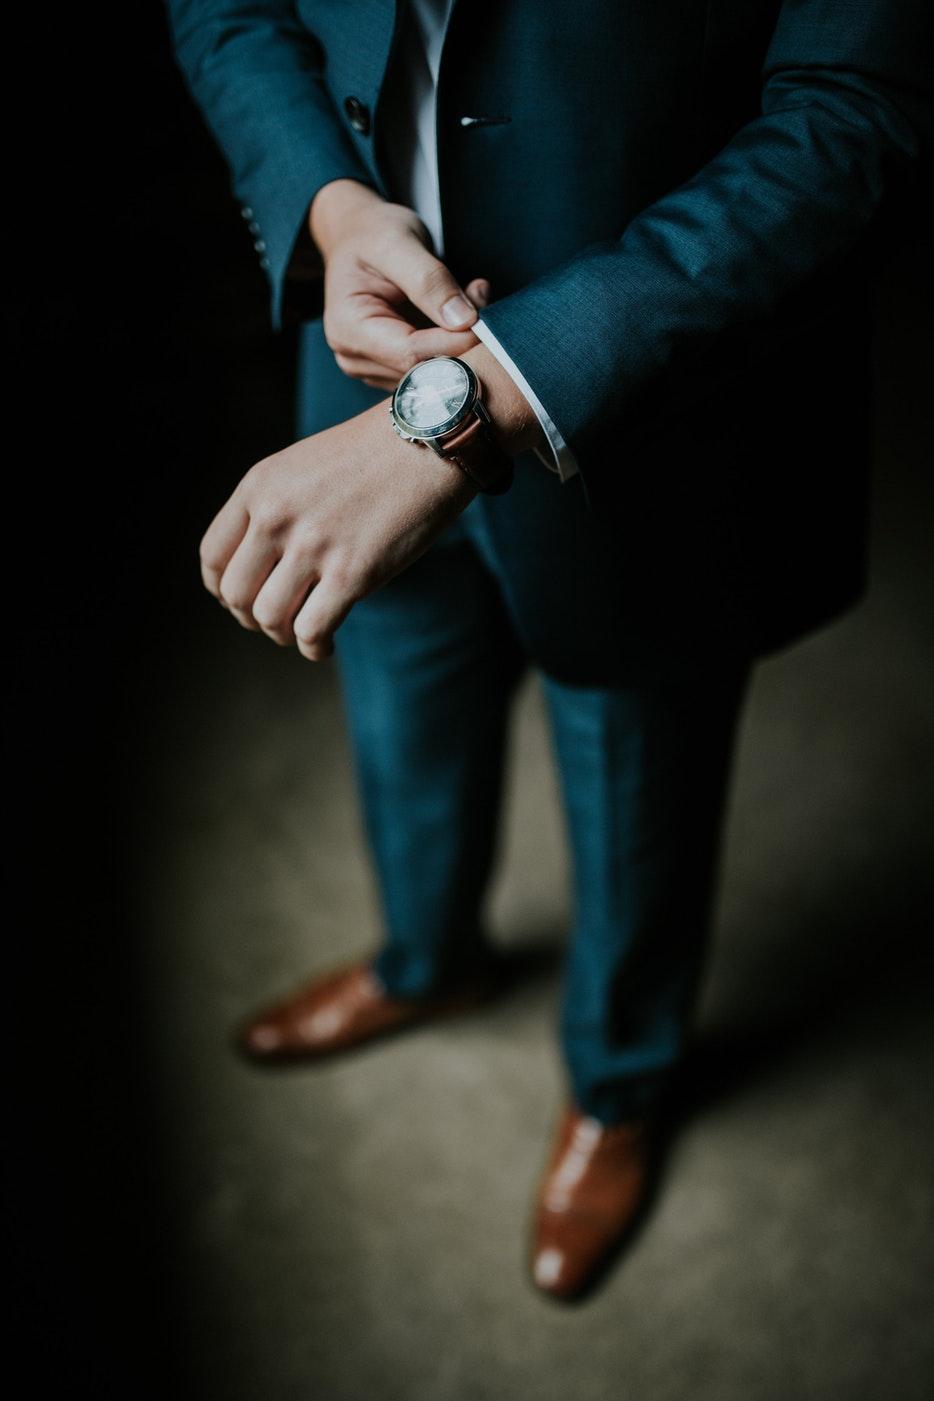 A Successful Business Coach's O-1 Visa - An RFE Success Story